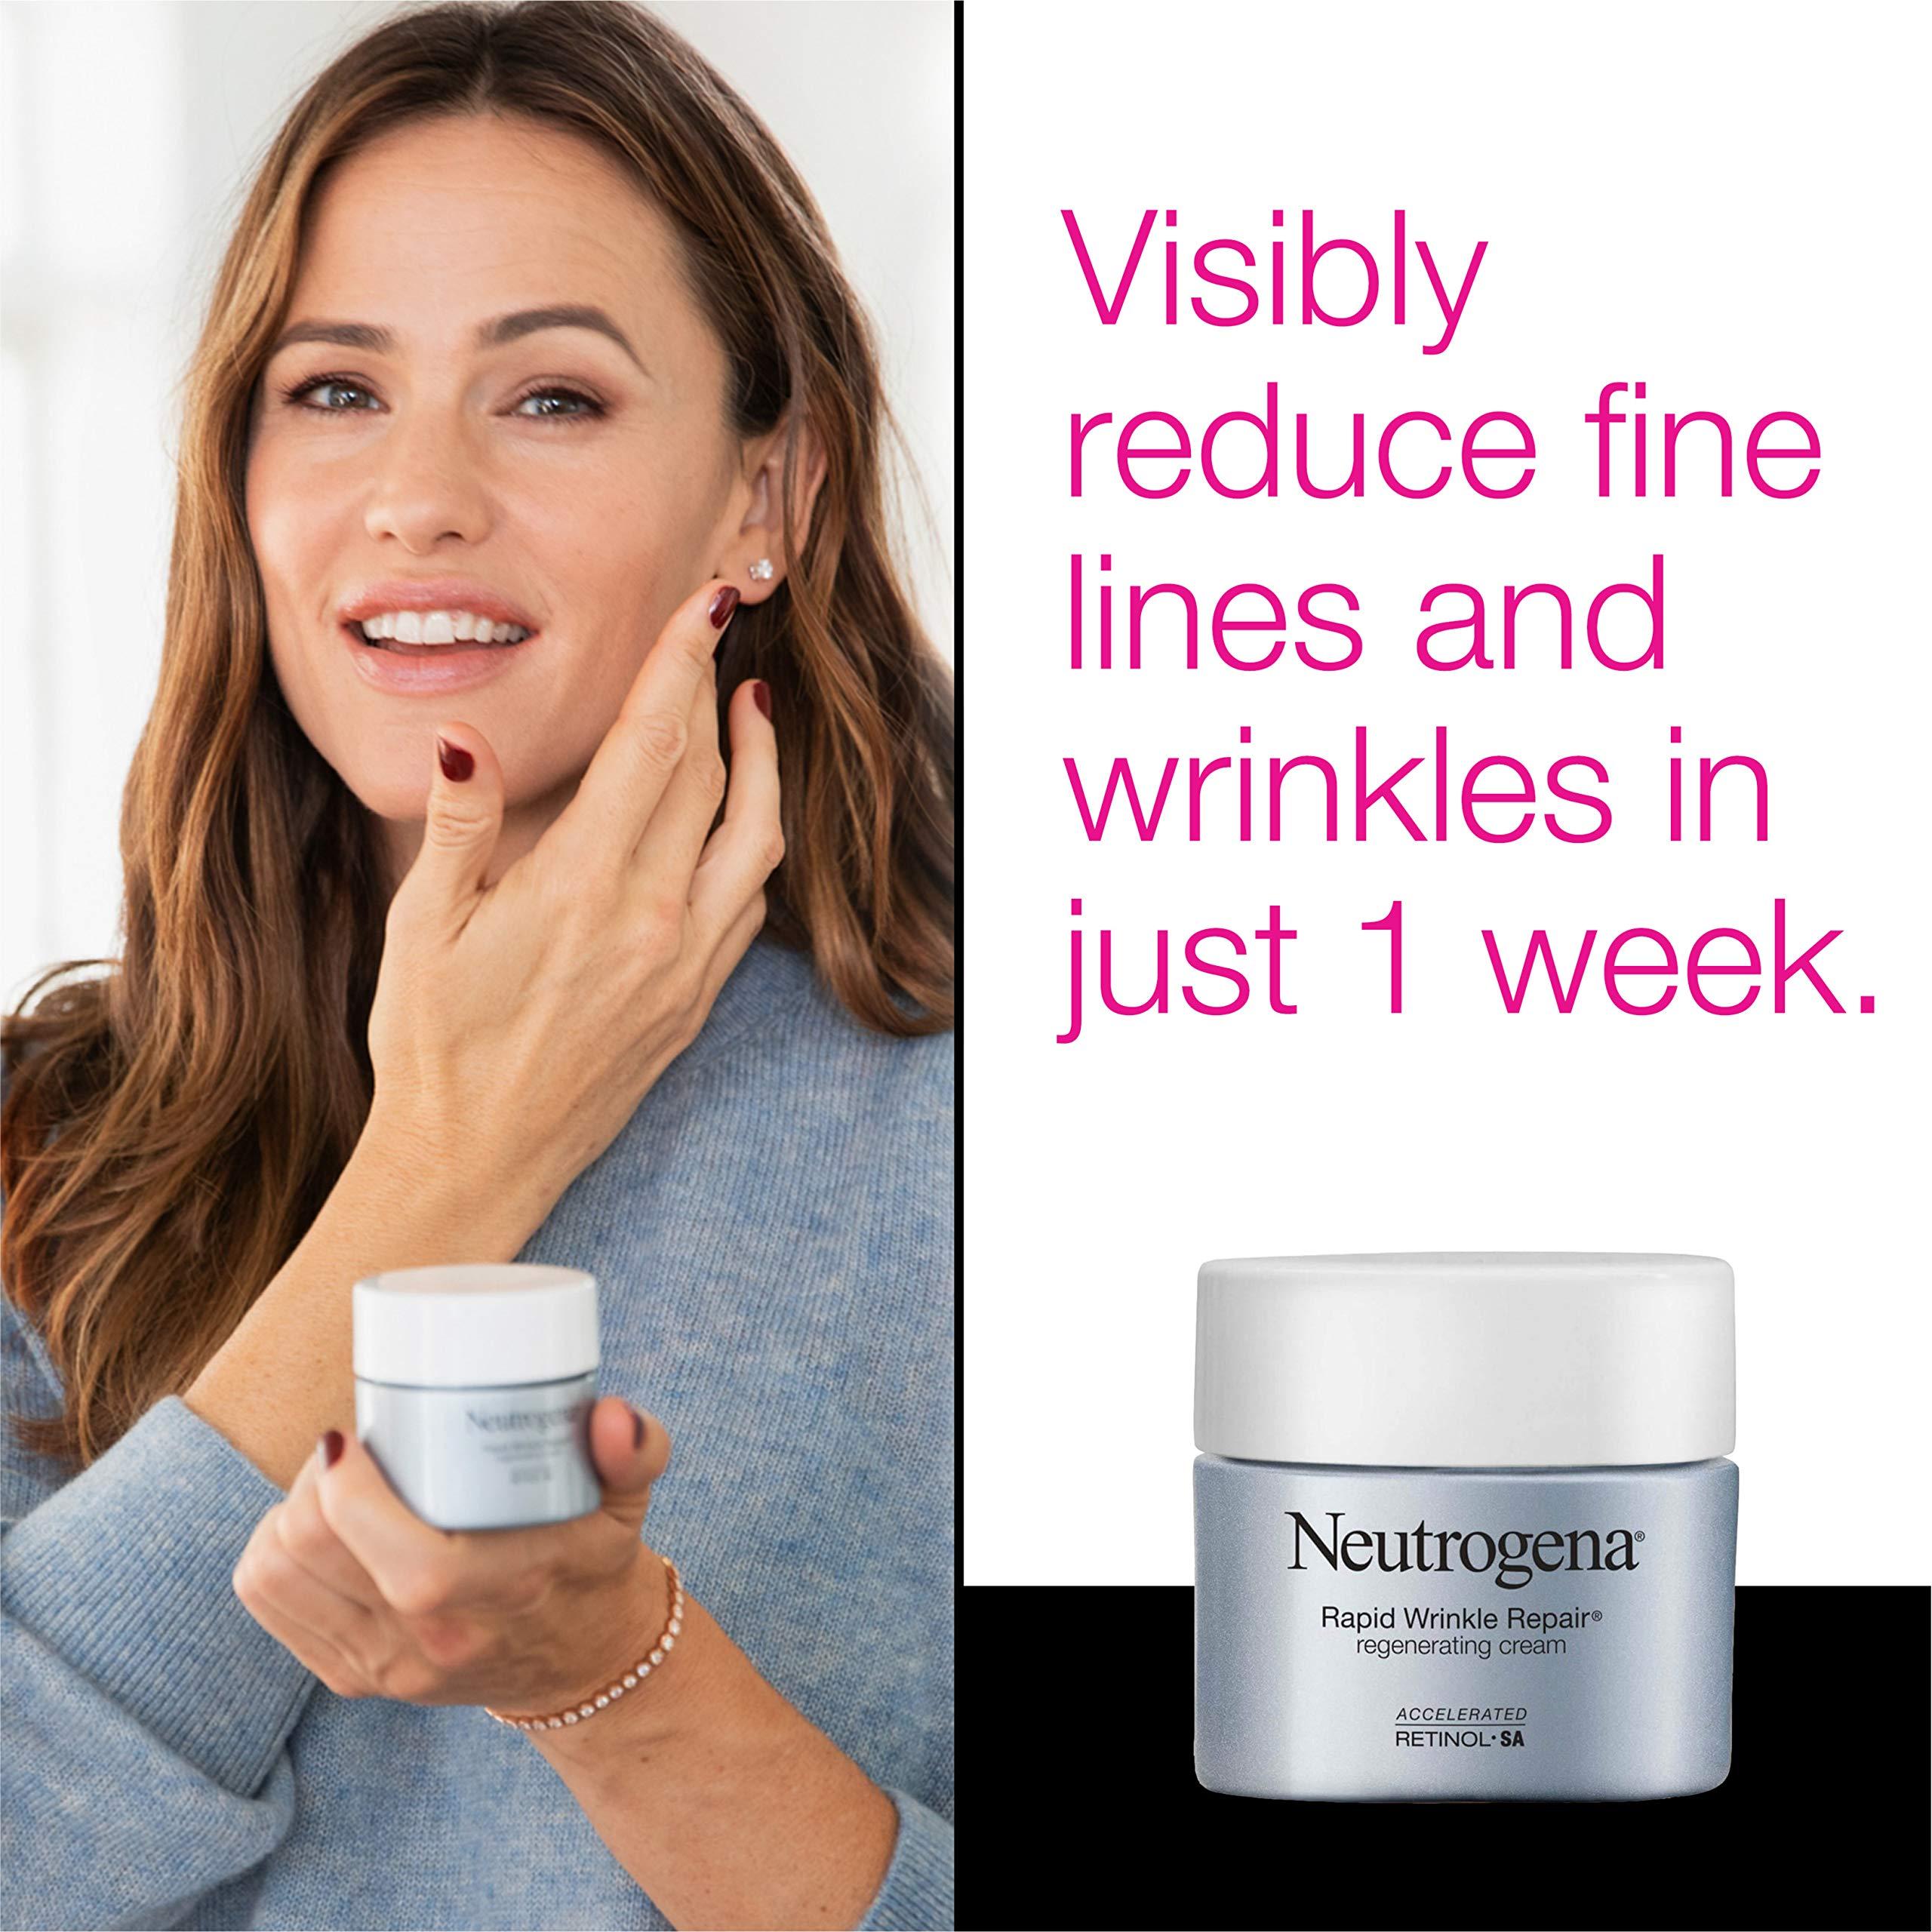 Neutrogena Rapid Wrinkle Repair Retinol Regenerating Anti-Aging Face Cream & Hyaluronic Acid; Anti-Wrinkle Retinol Moisturizer & Neck Cream, with Hyaluronic Acid & Retinol